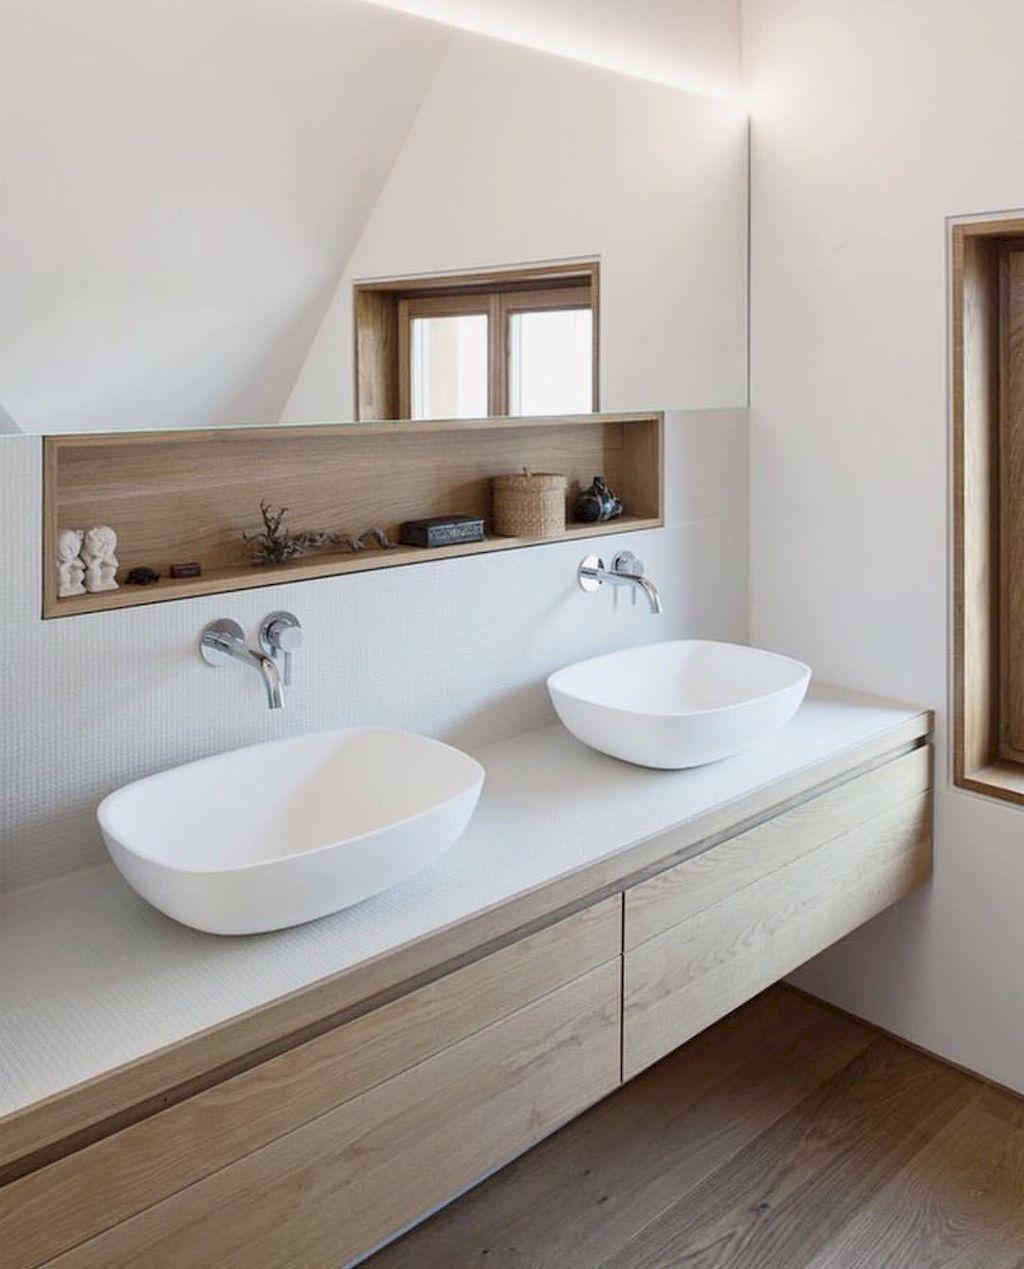 Cool 60 Stunning Scandinavian Bathroom Design Ideas To Inspire You Livingmarch Decor